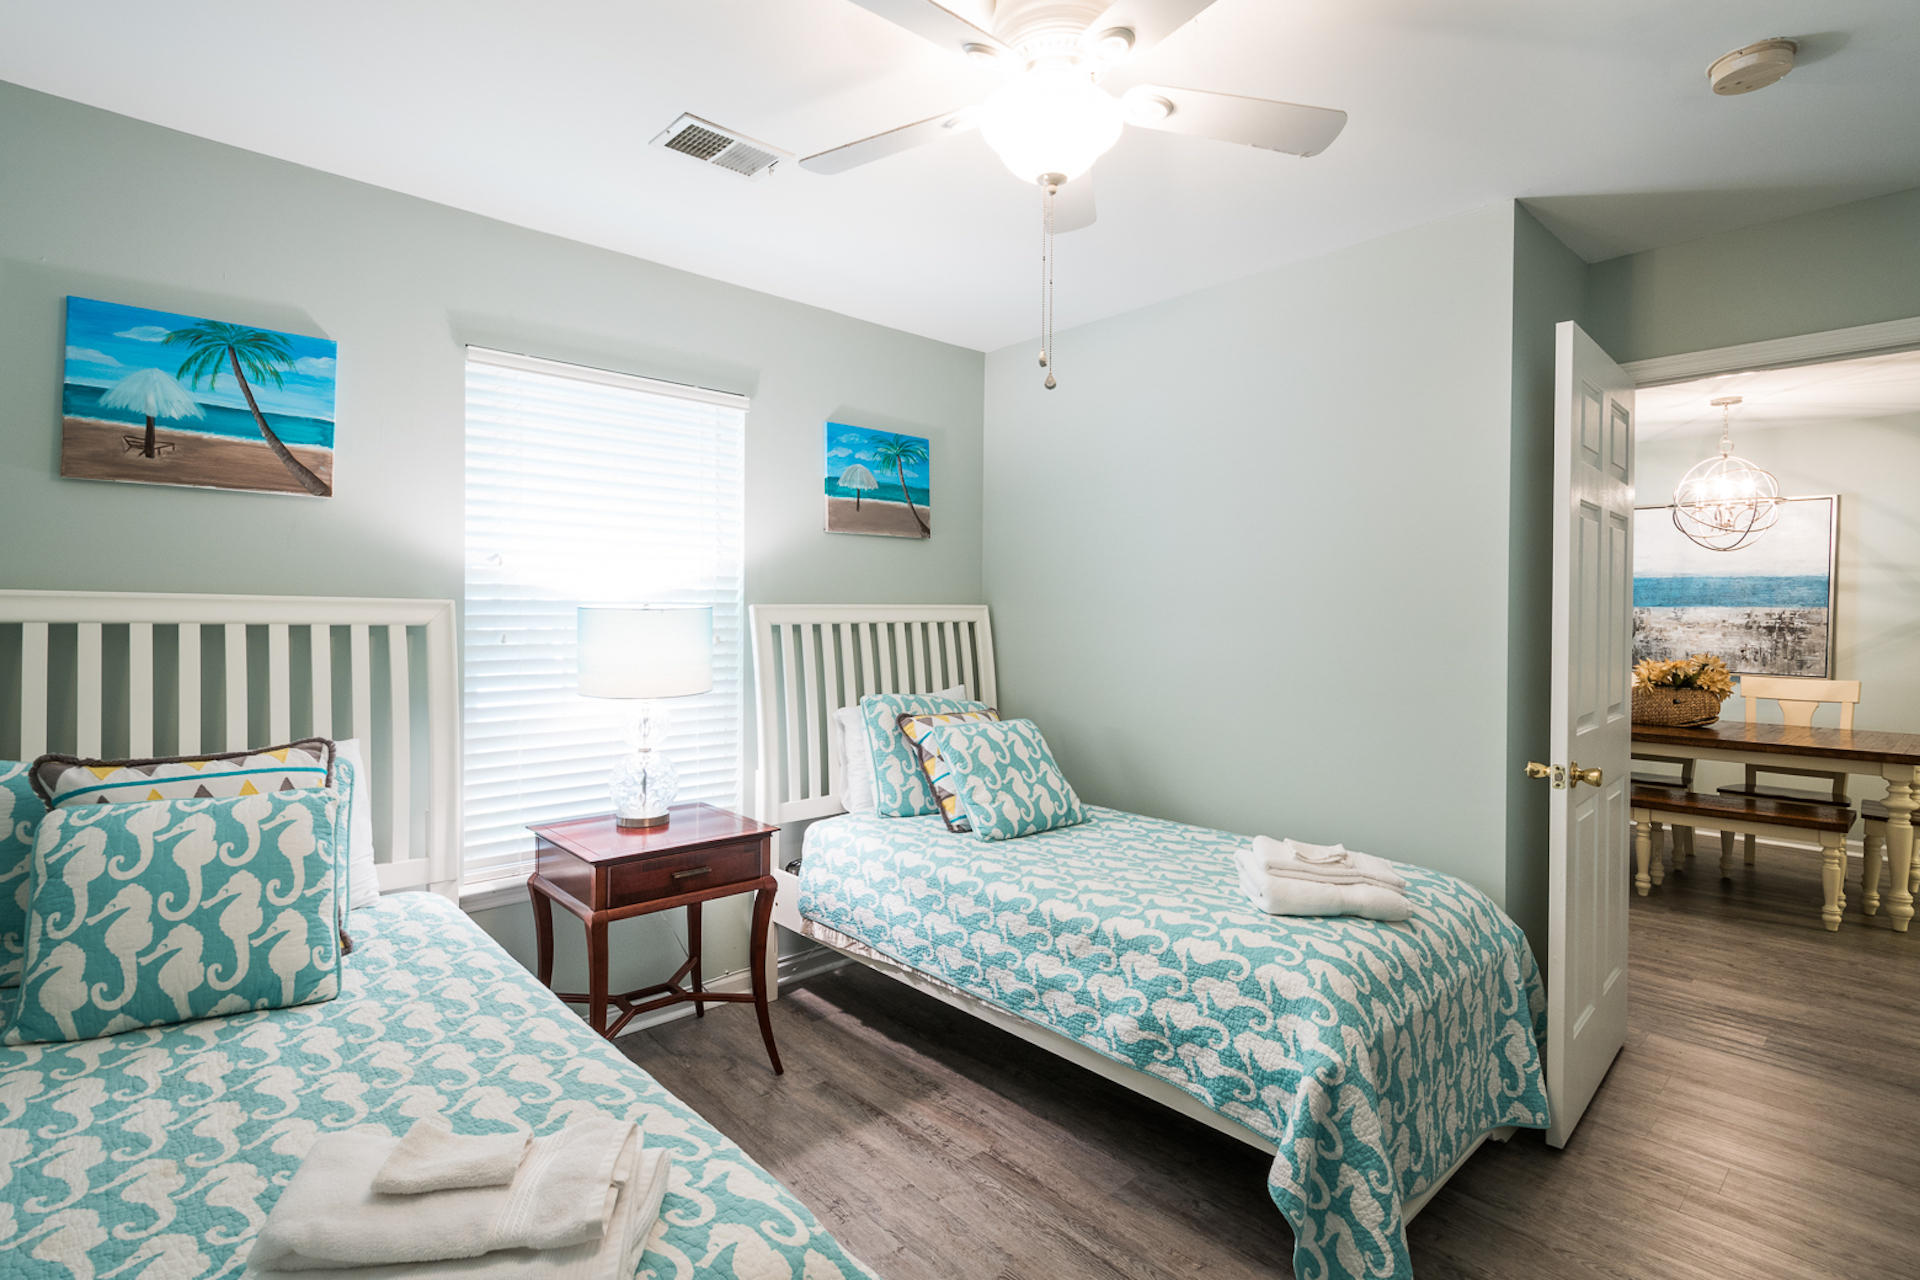 Meridian Place Homes For Sale - 1420 Amanda Park, Charleston, SC - 6